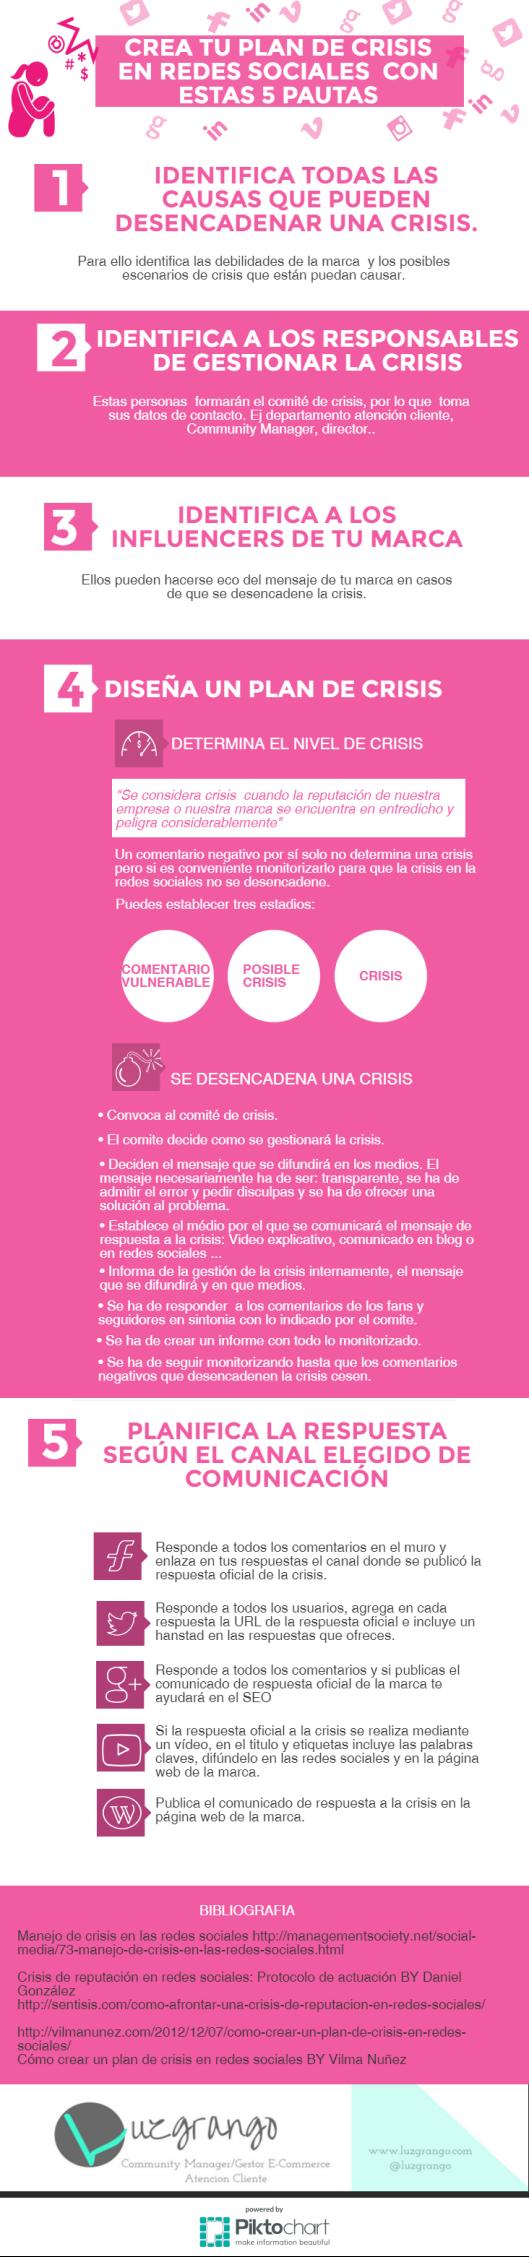 plan-crisis-redes-sociales-infografia